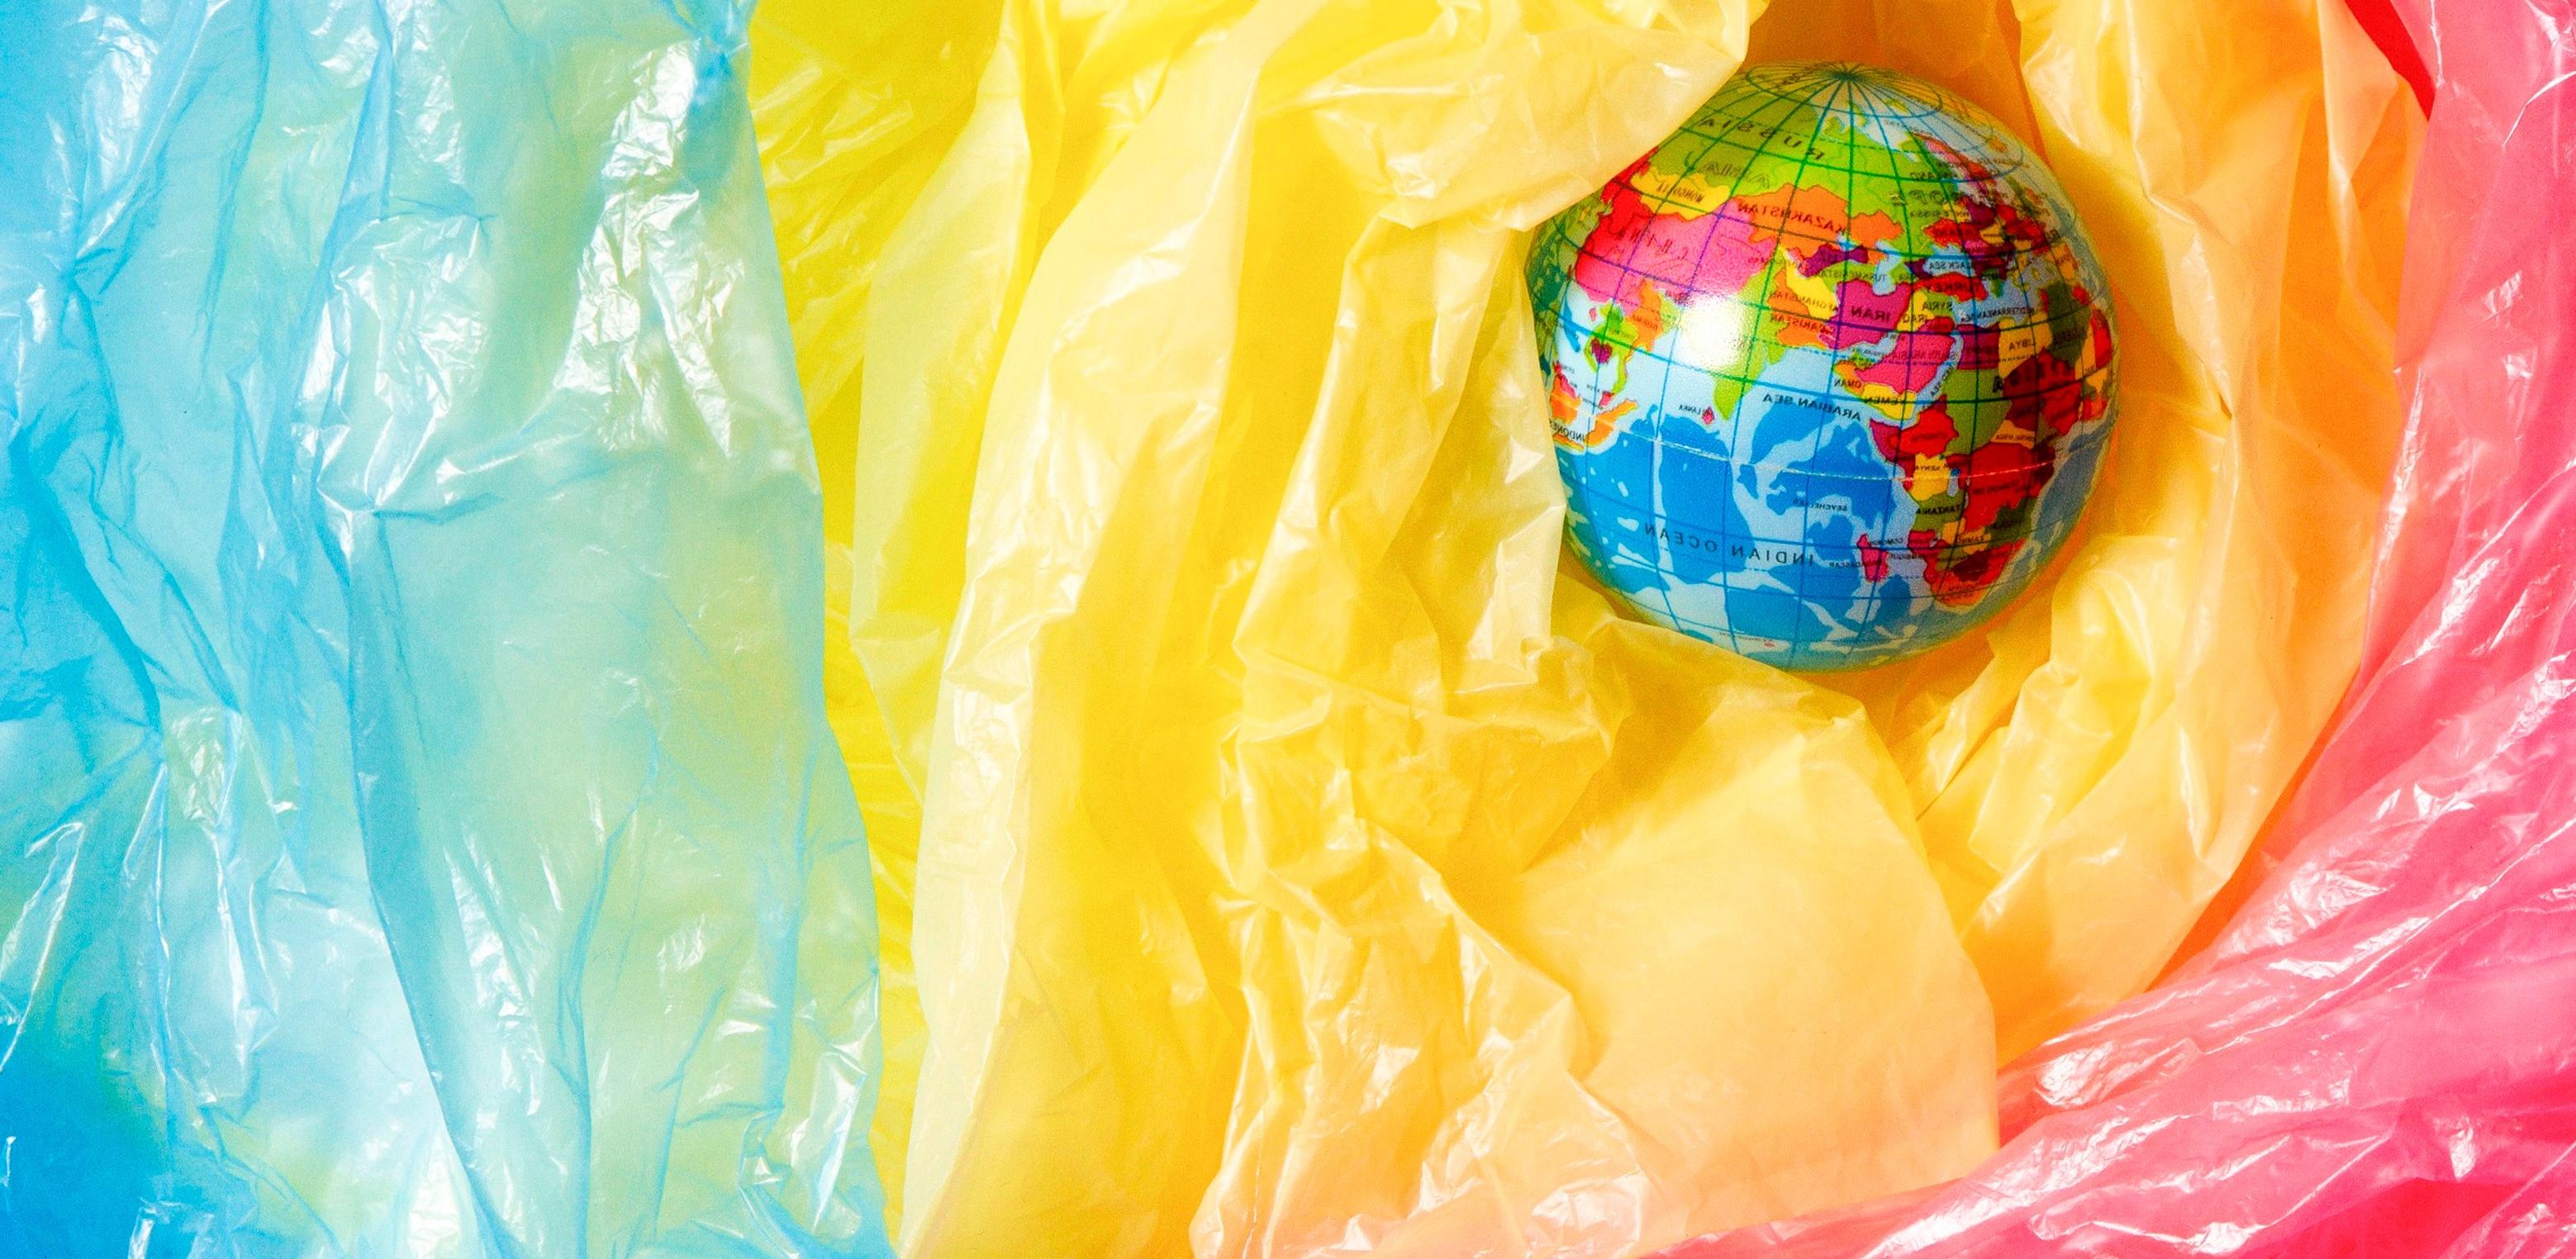 Plastic-Free Newsletter – Vol. 6 July